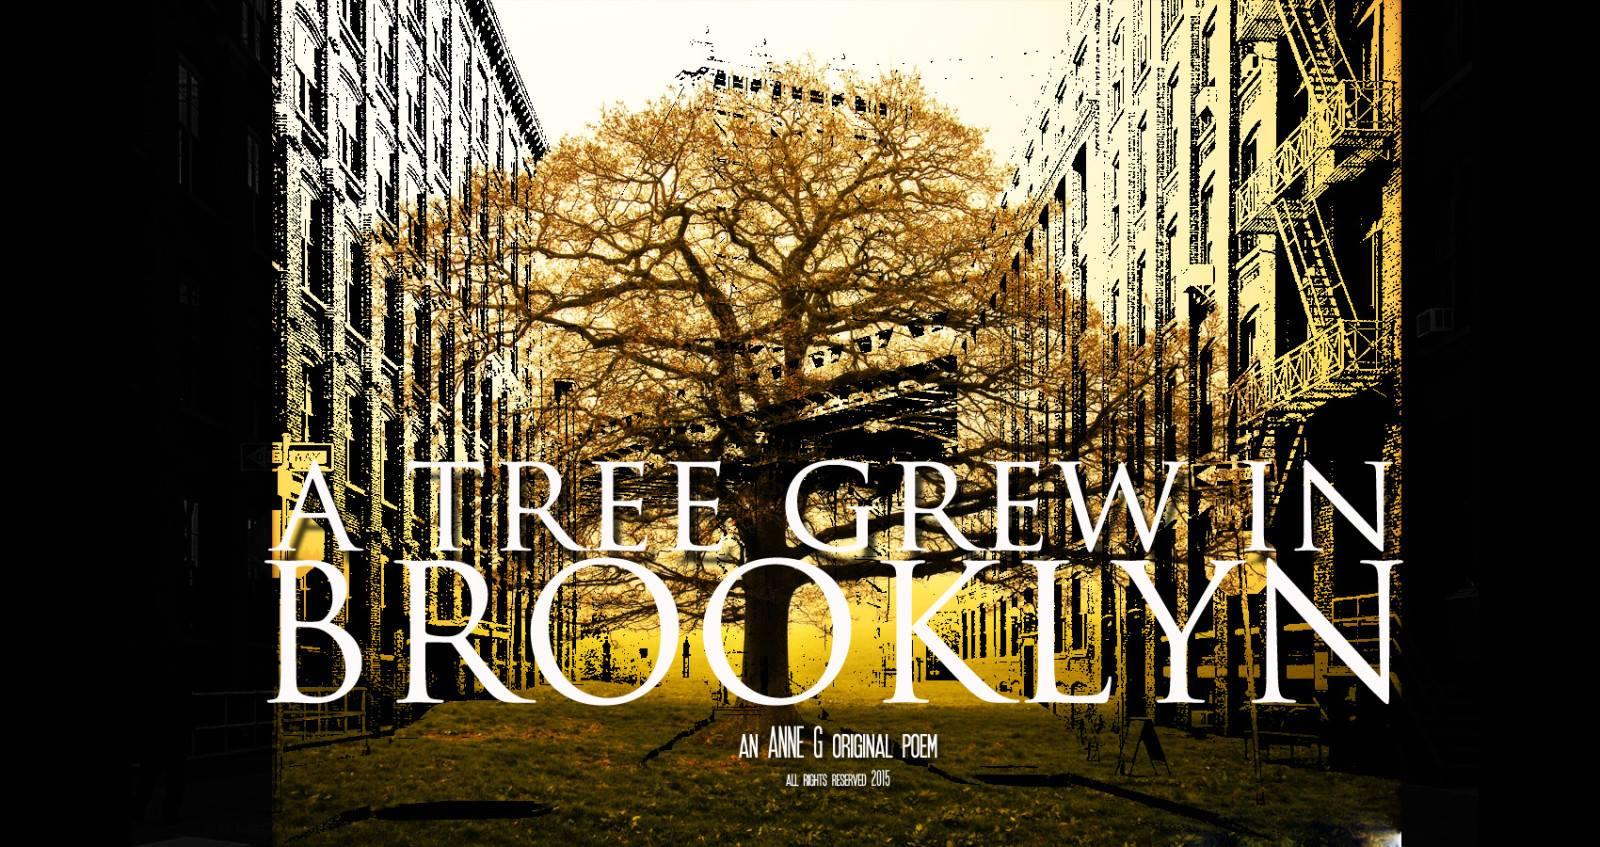 spillwords.com a Tree Grew In Brooklyn by Anne G